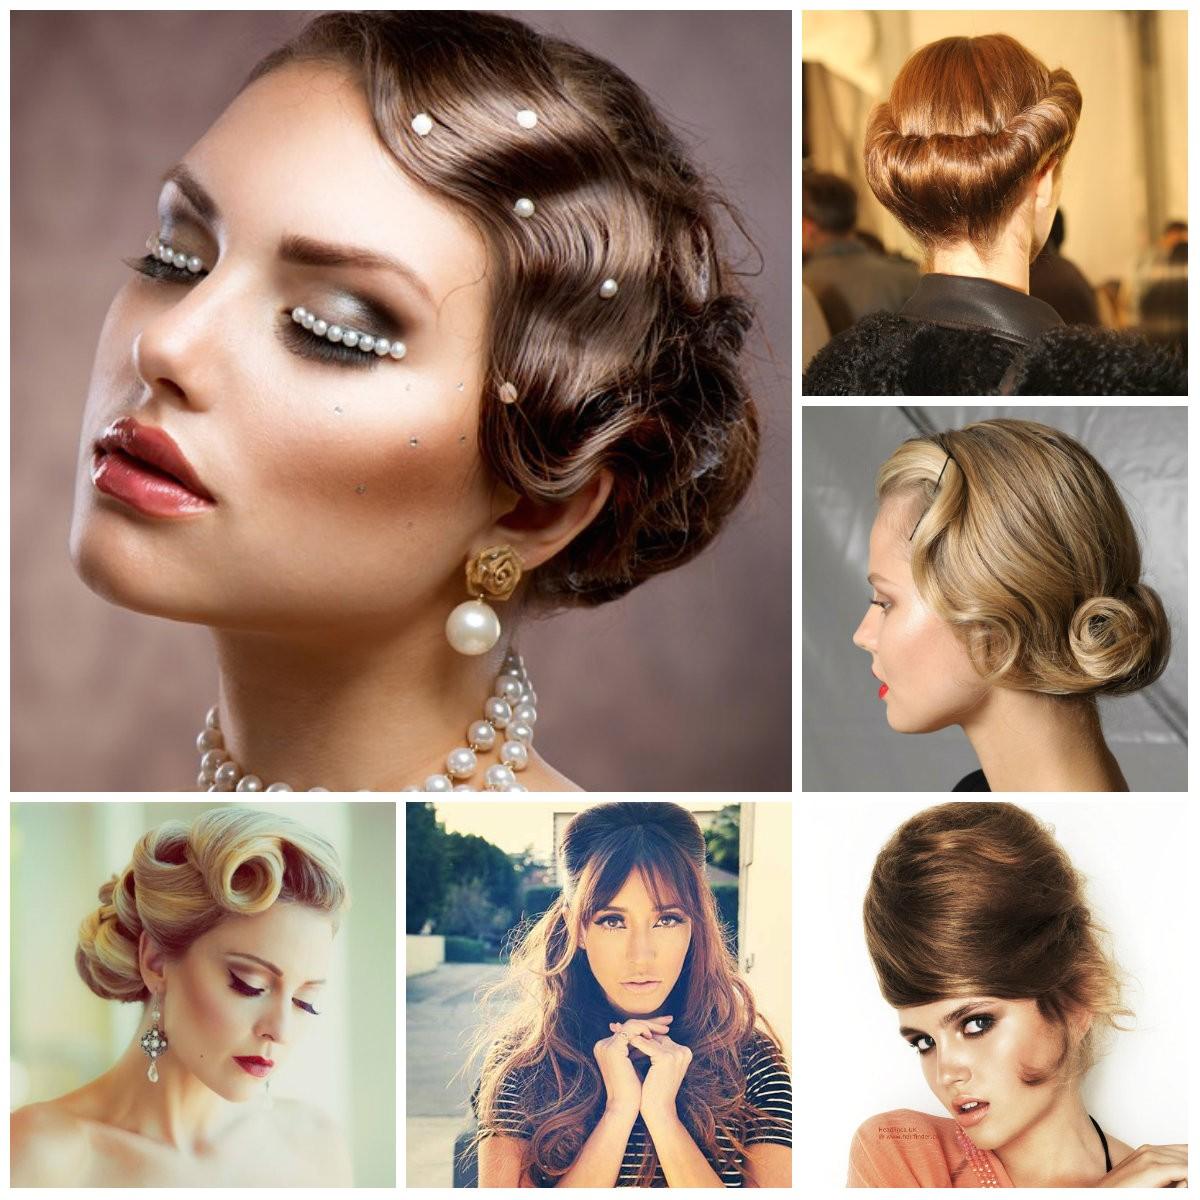 2018 vintage hairstyles ideas